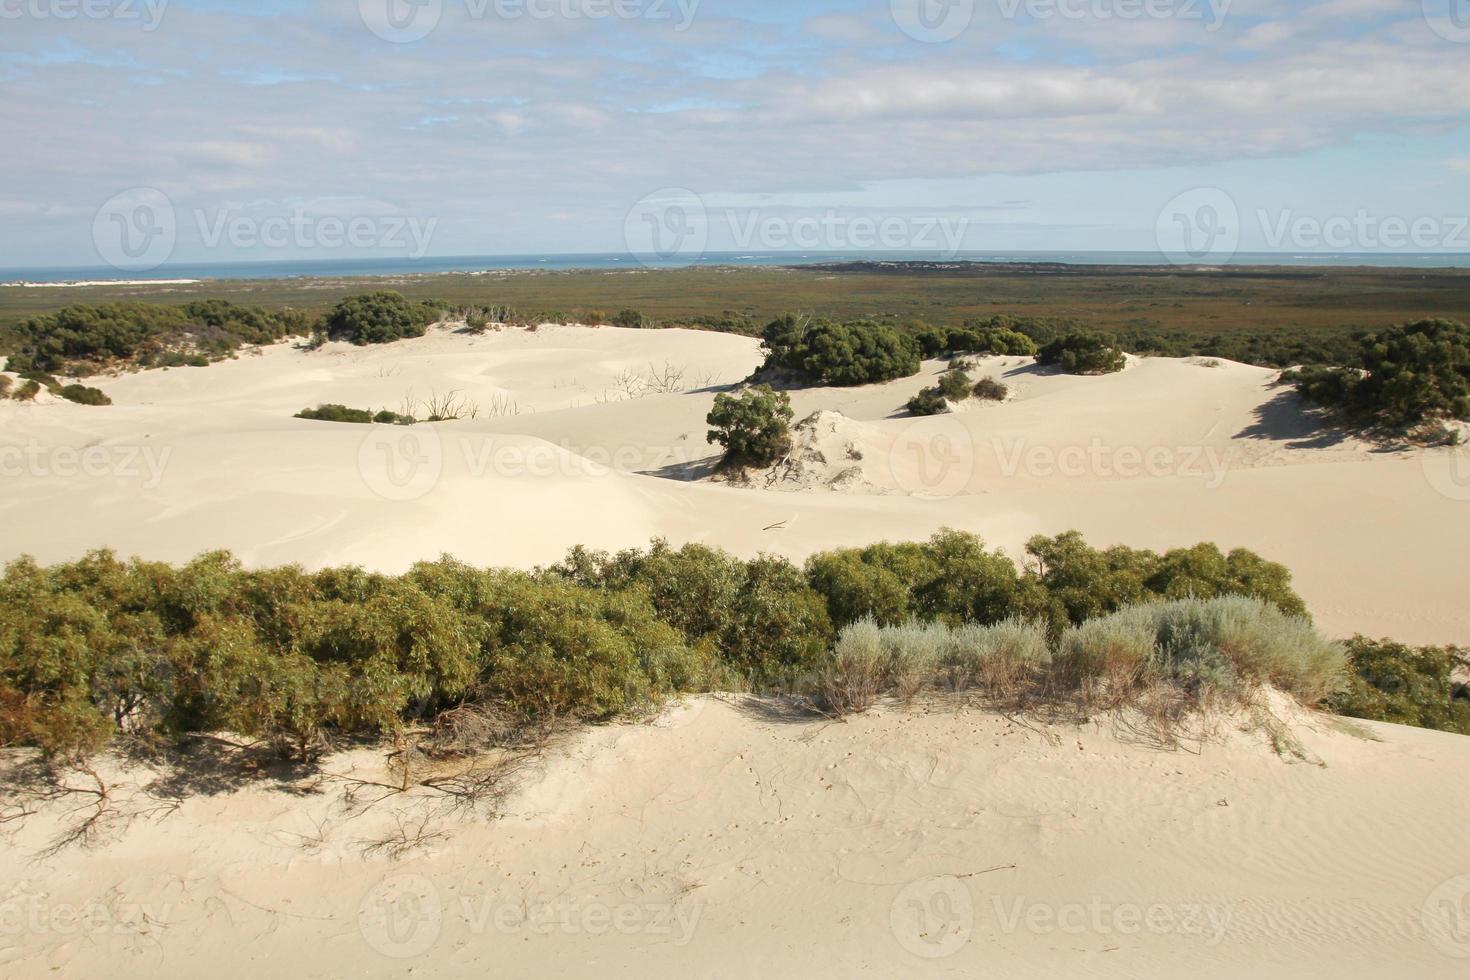 The Desert photo